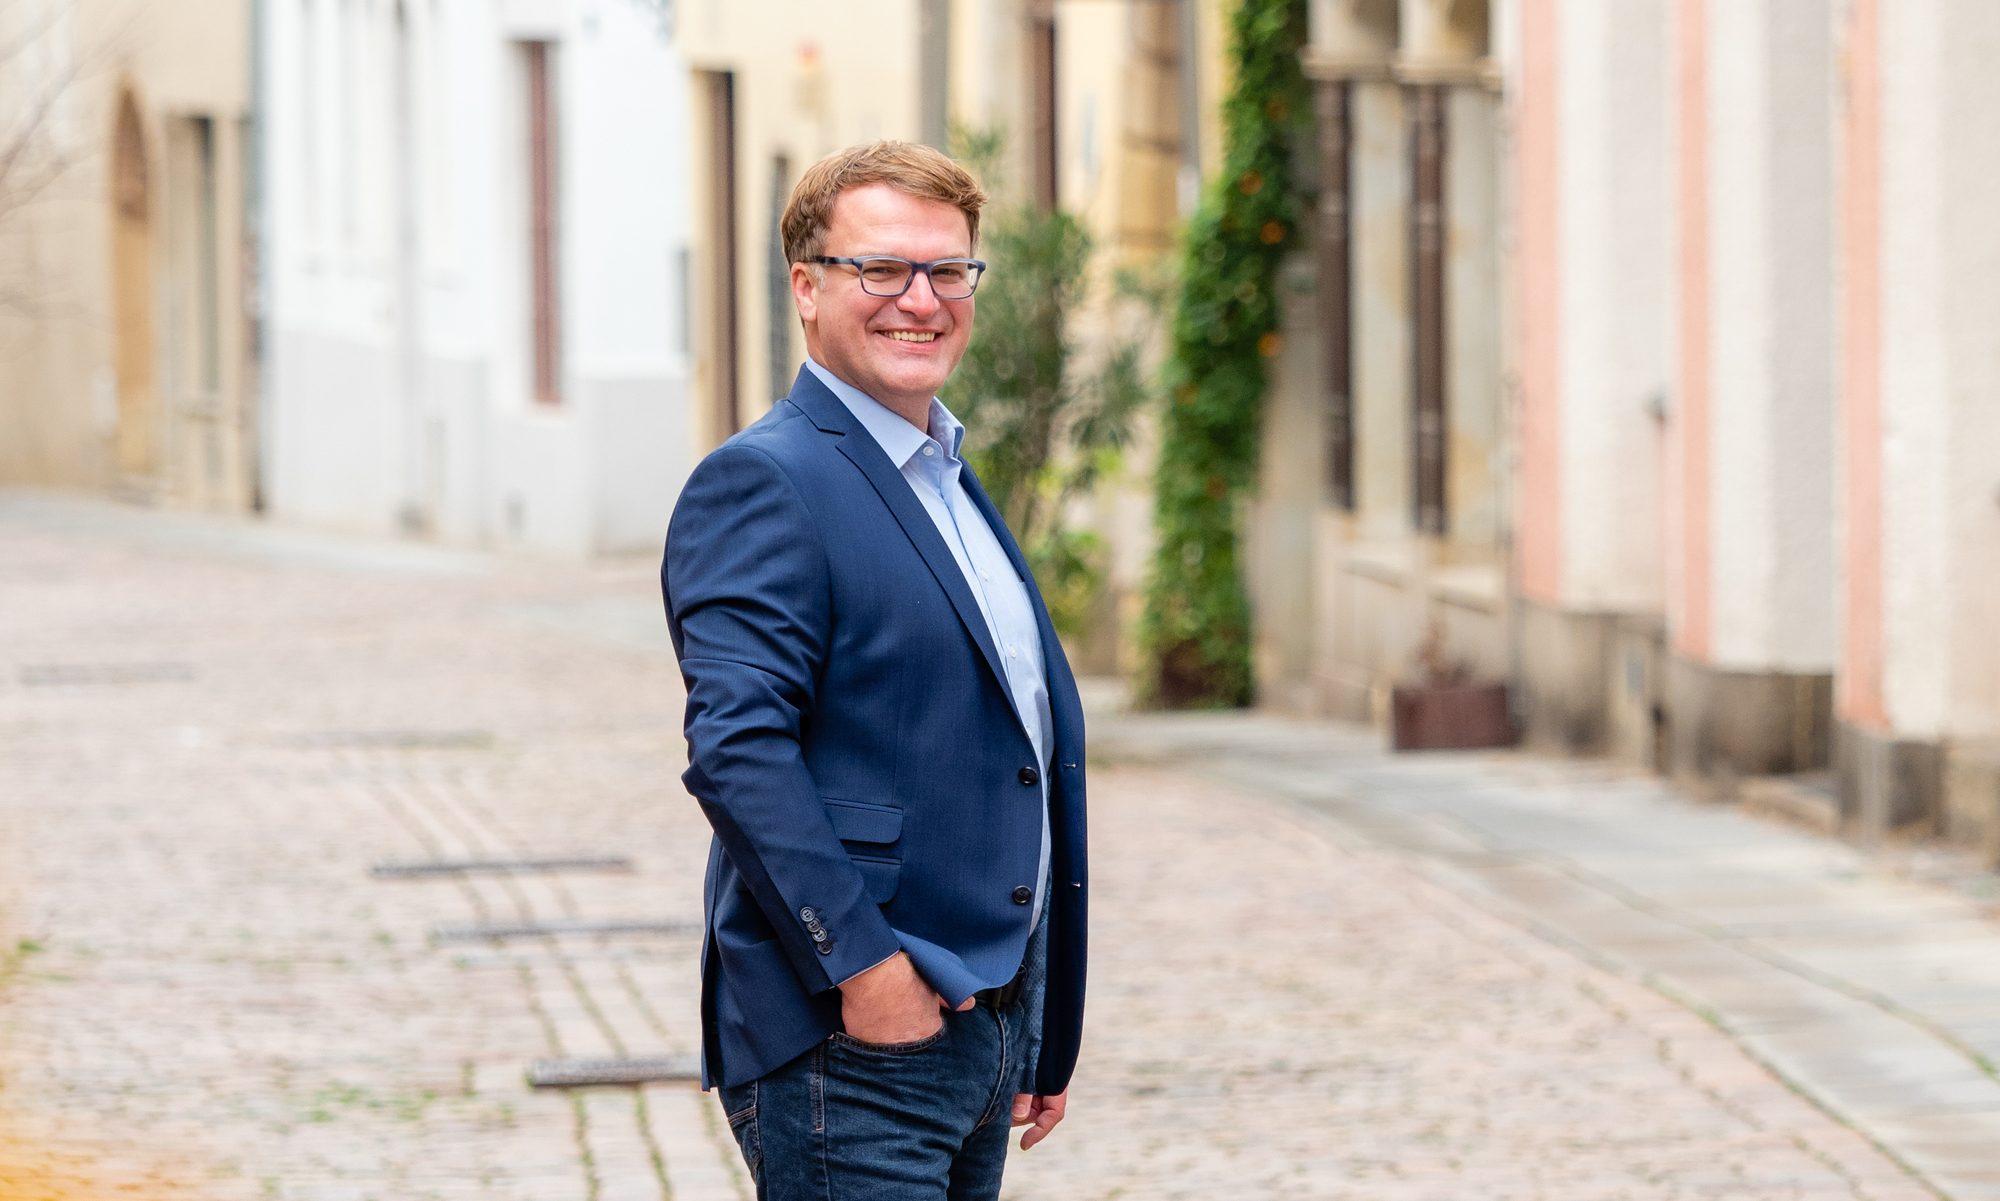 Stadtrat für Pirna